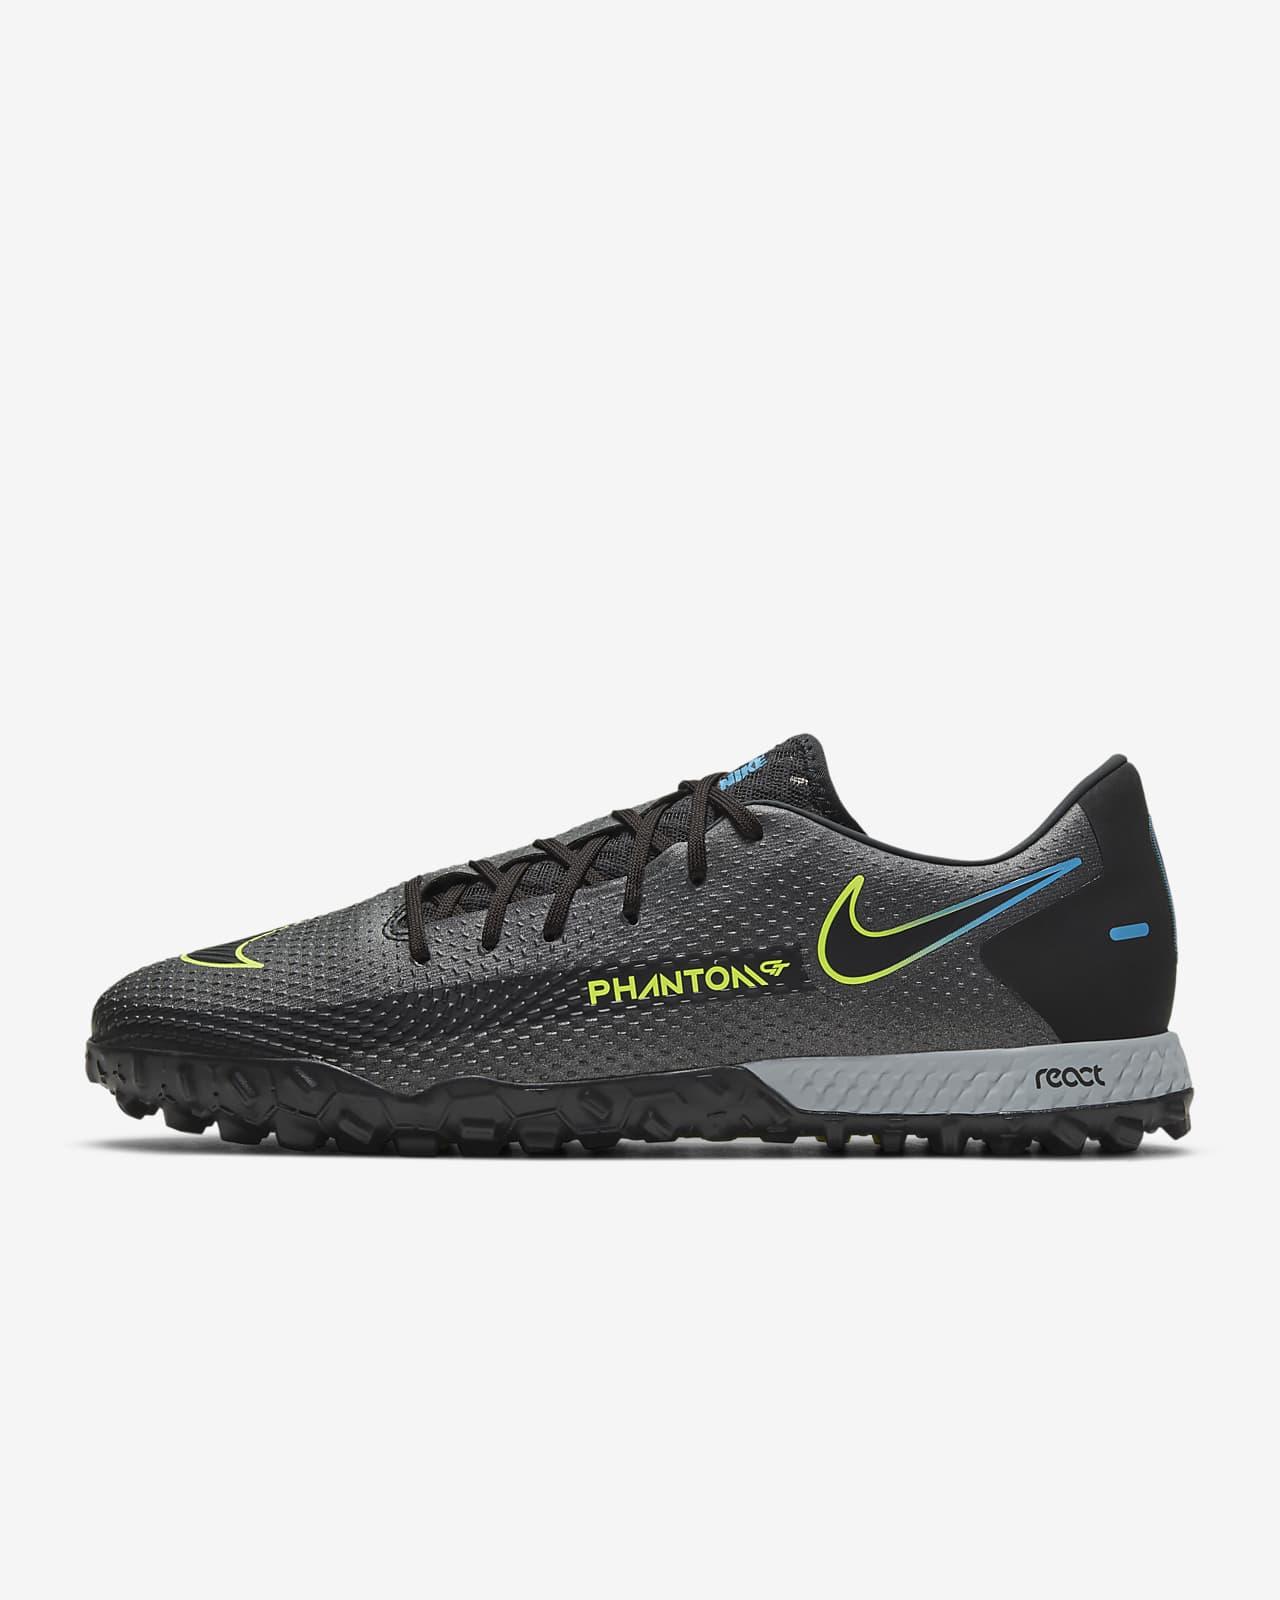 Nike React Phantom GT Pro TF-fodboldsko til grus